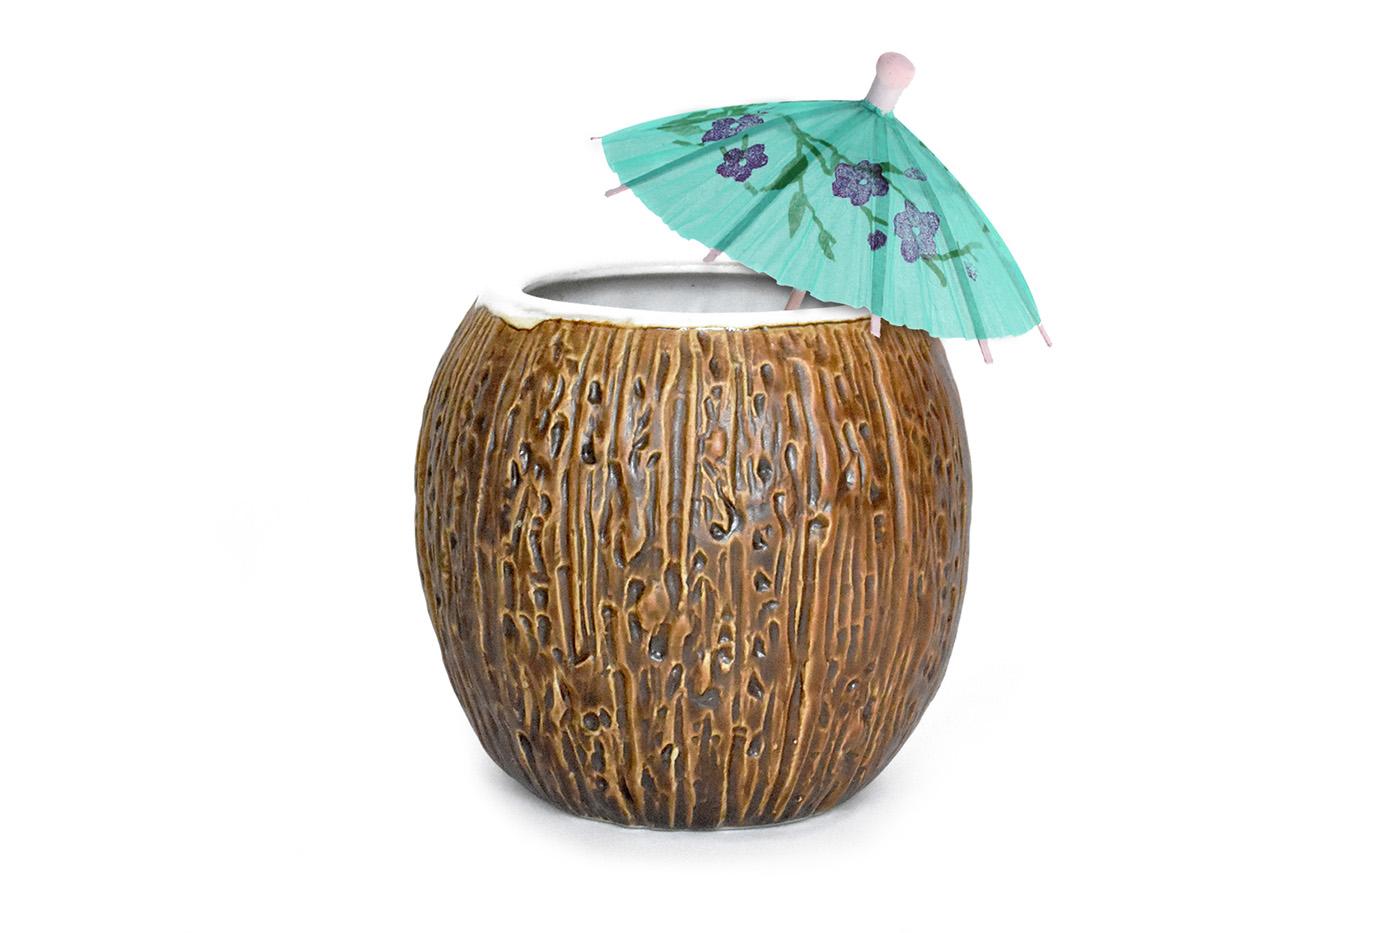 Coconut Mug_clean 1B.jpg